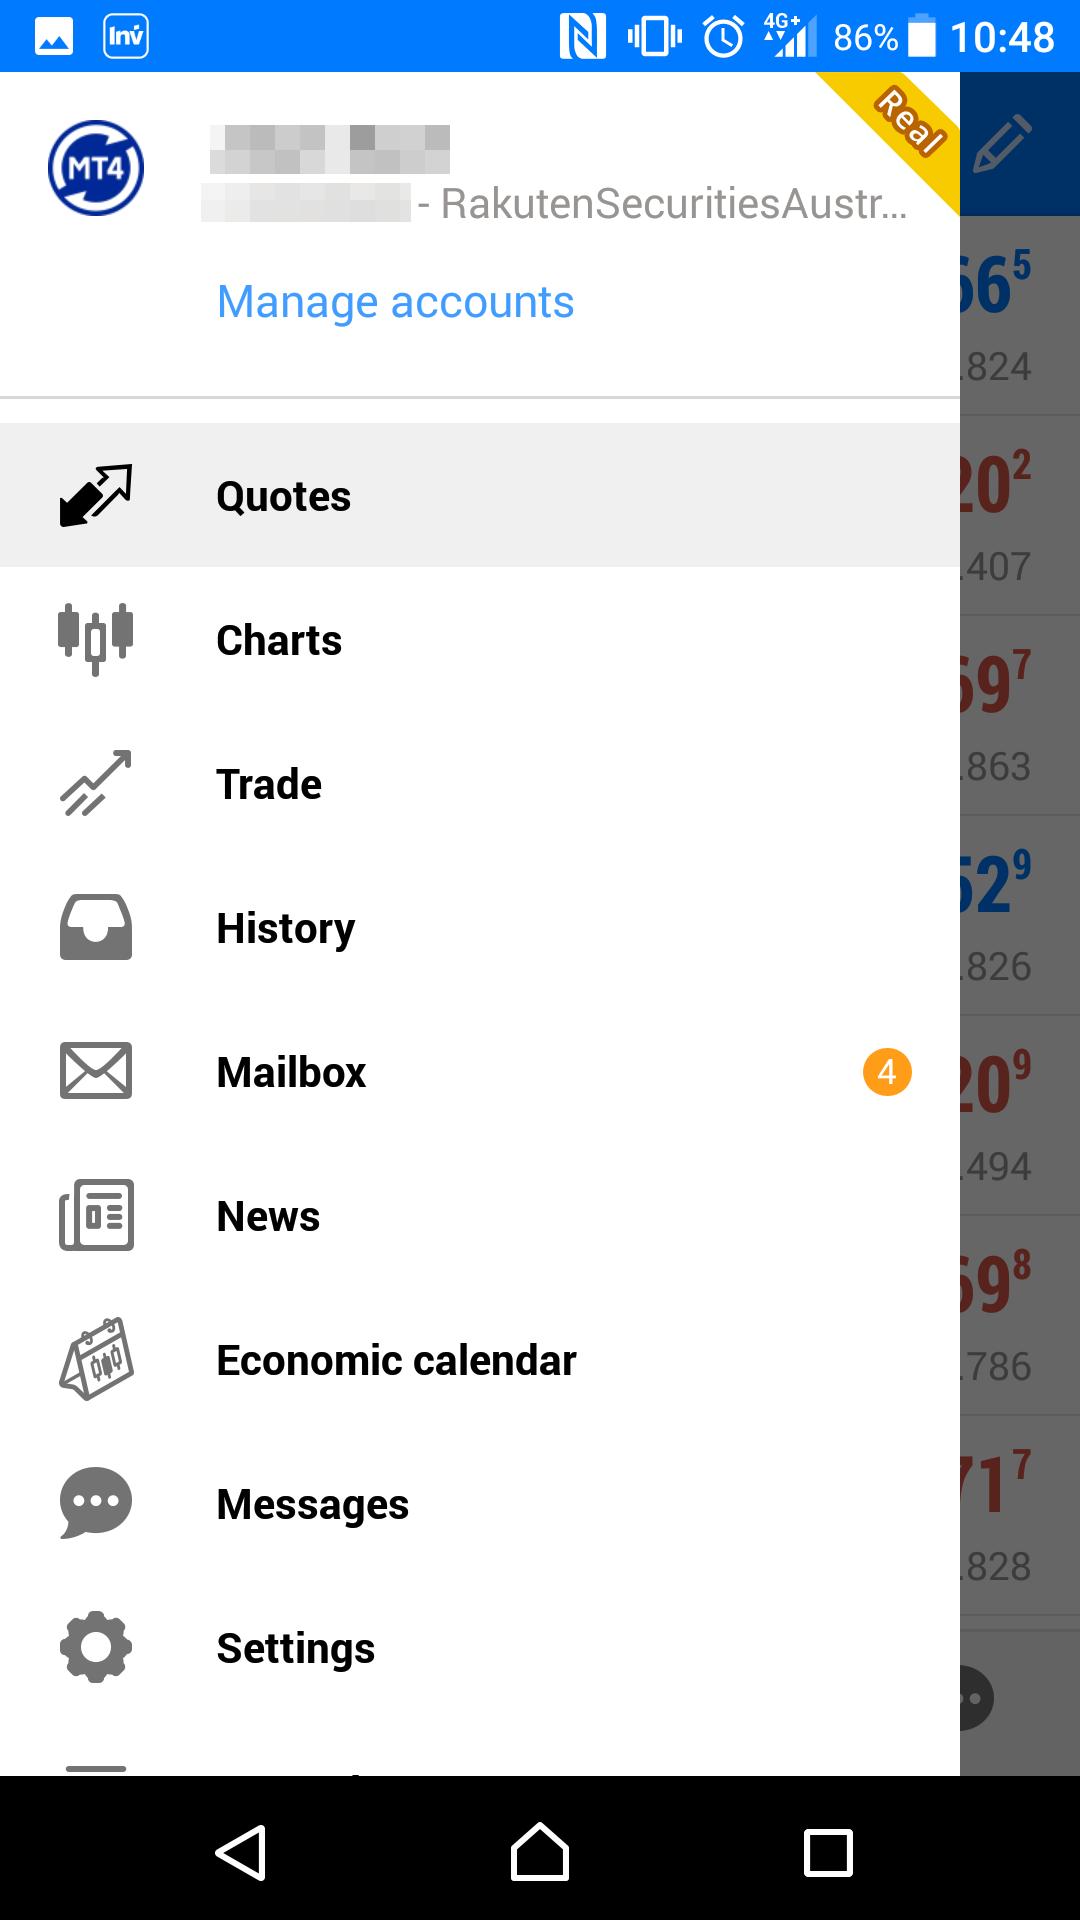 Rakuten Securities review - Mobile trading platform